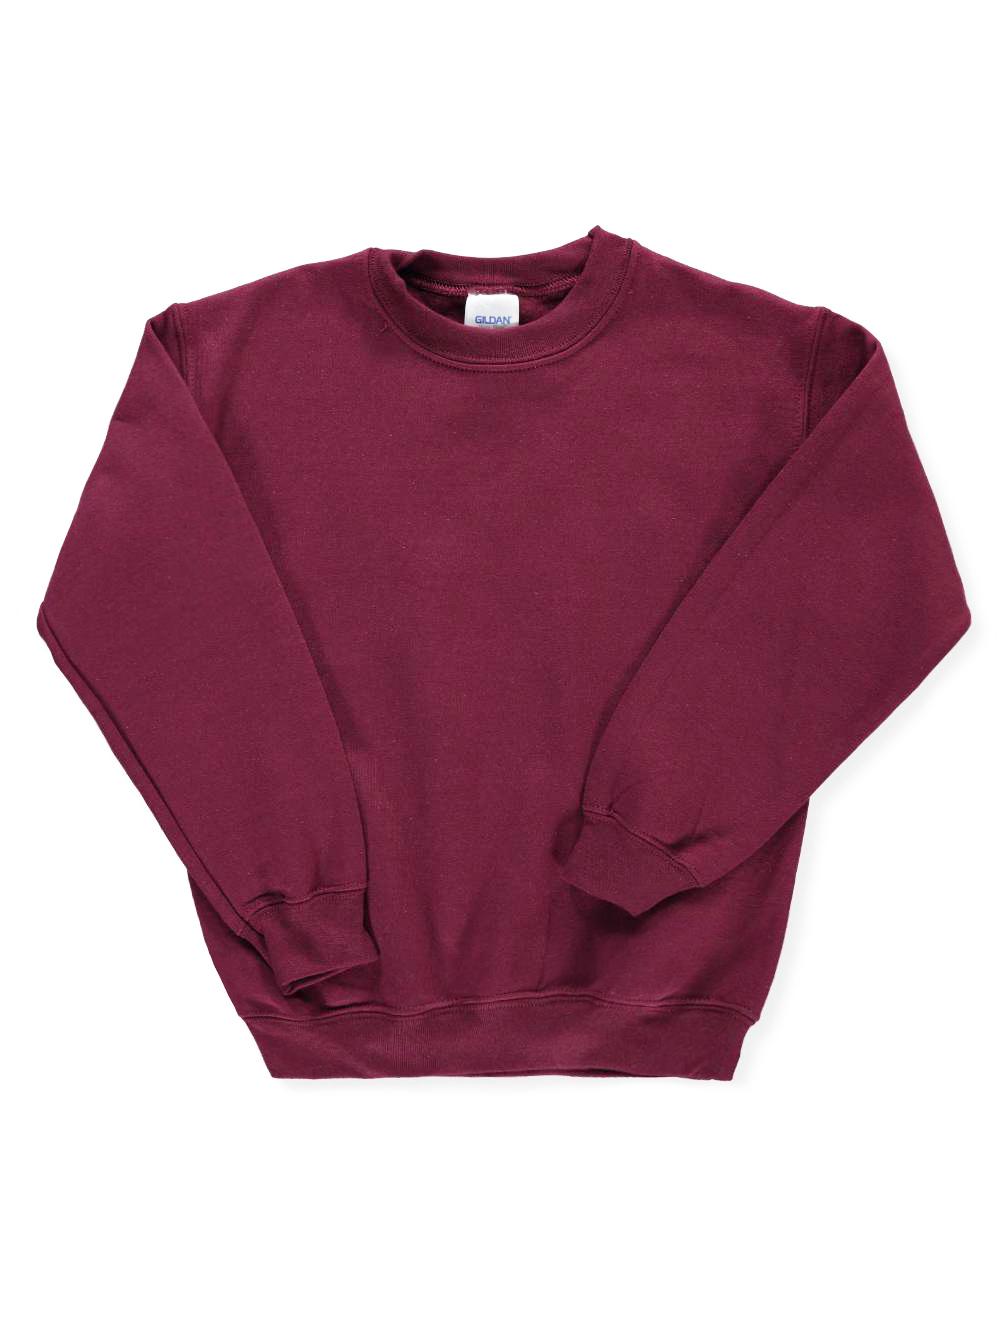 Gildan Unisex Crewneck Sweatshirt (Youth Sizes XS - XL)